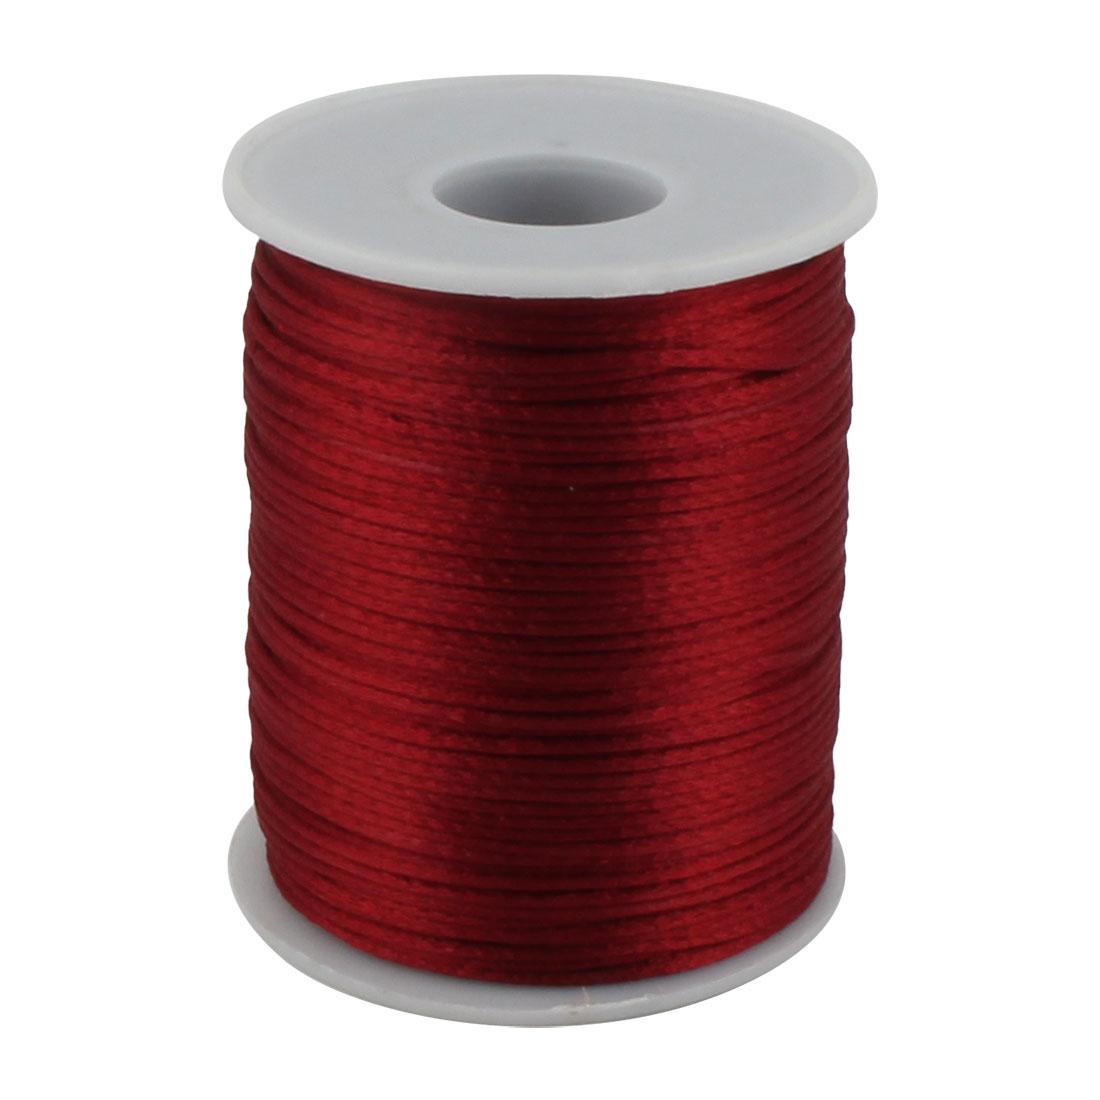 Festival Nylon DIY Braided Chinese Knot Cord Thread String Burgundy 109 Yards